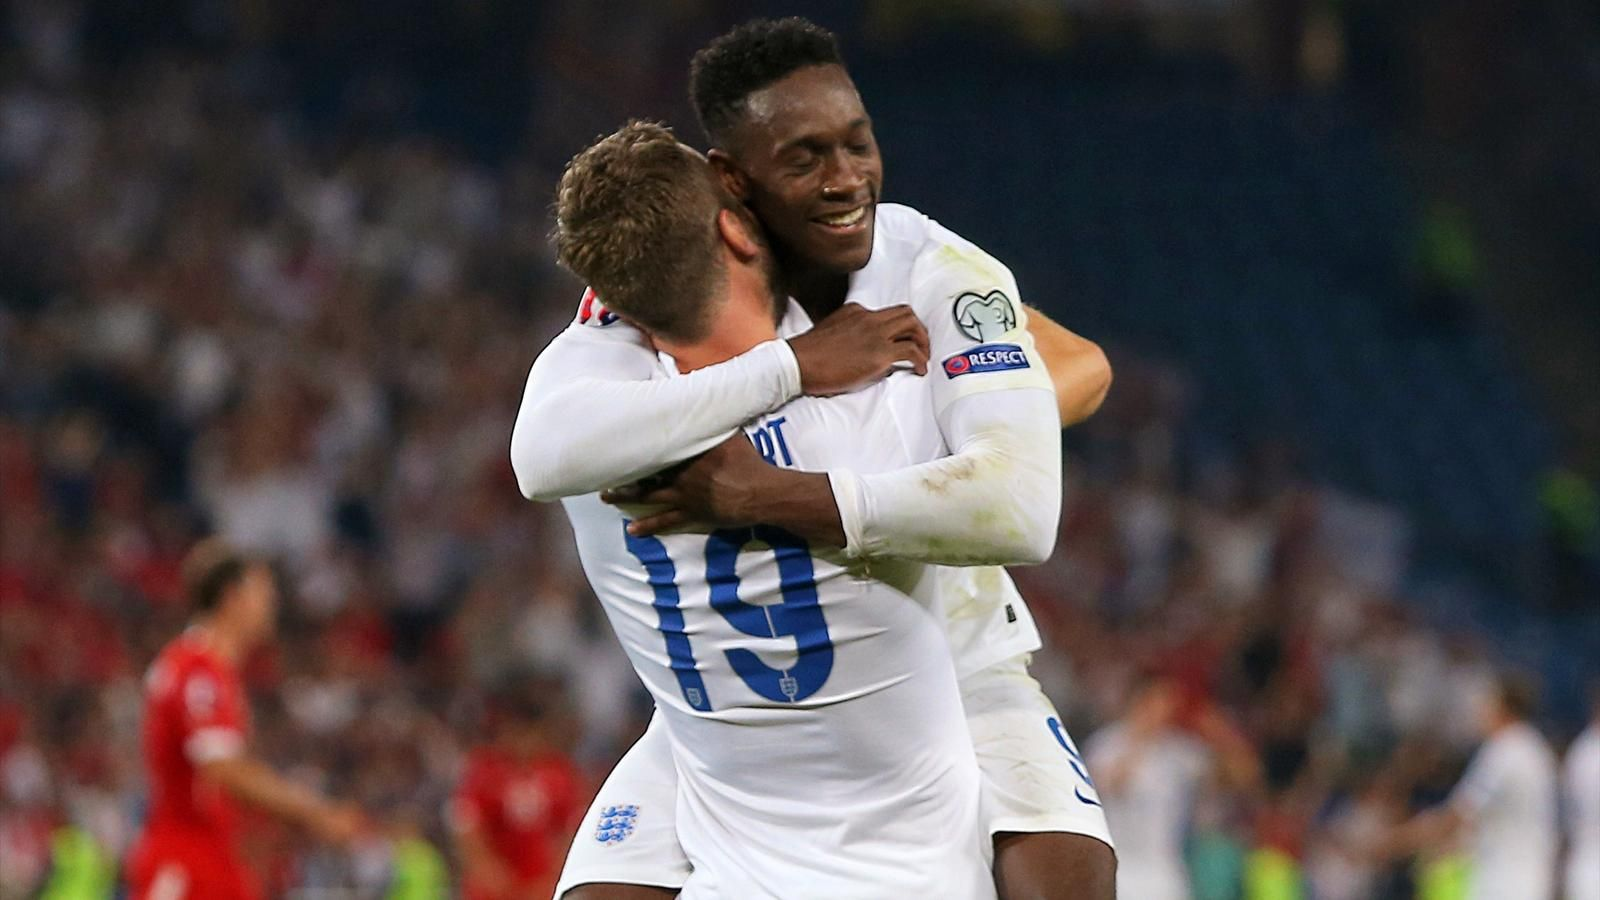 Англия — Швейцария: 08-09-2015